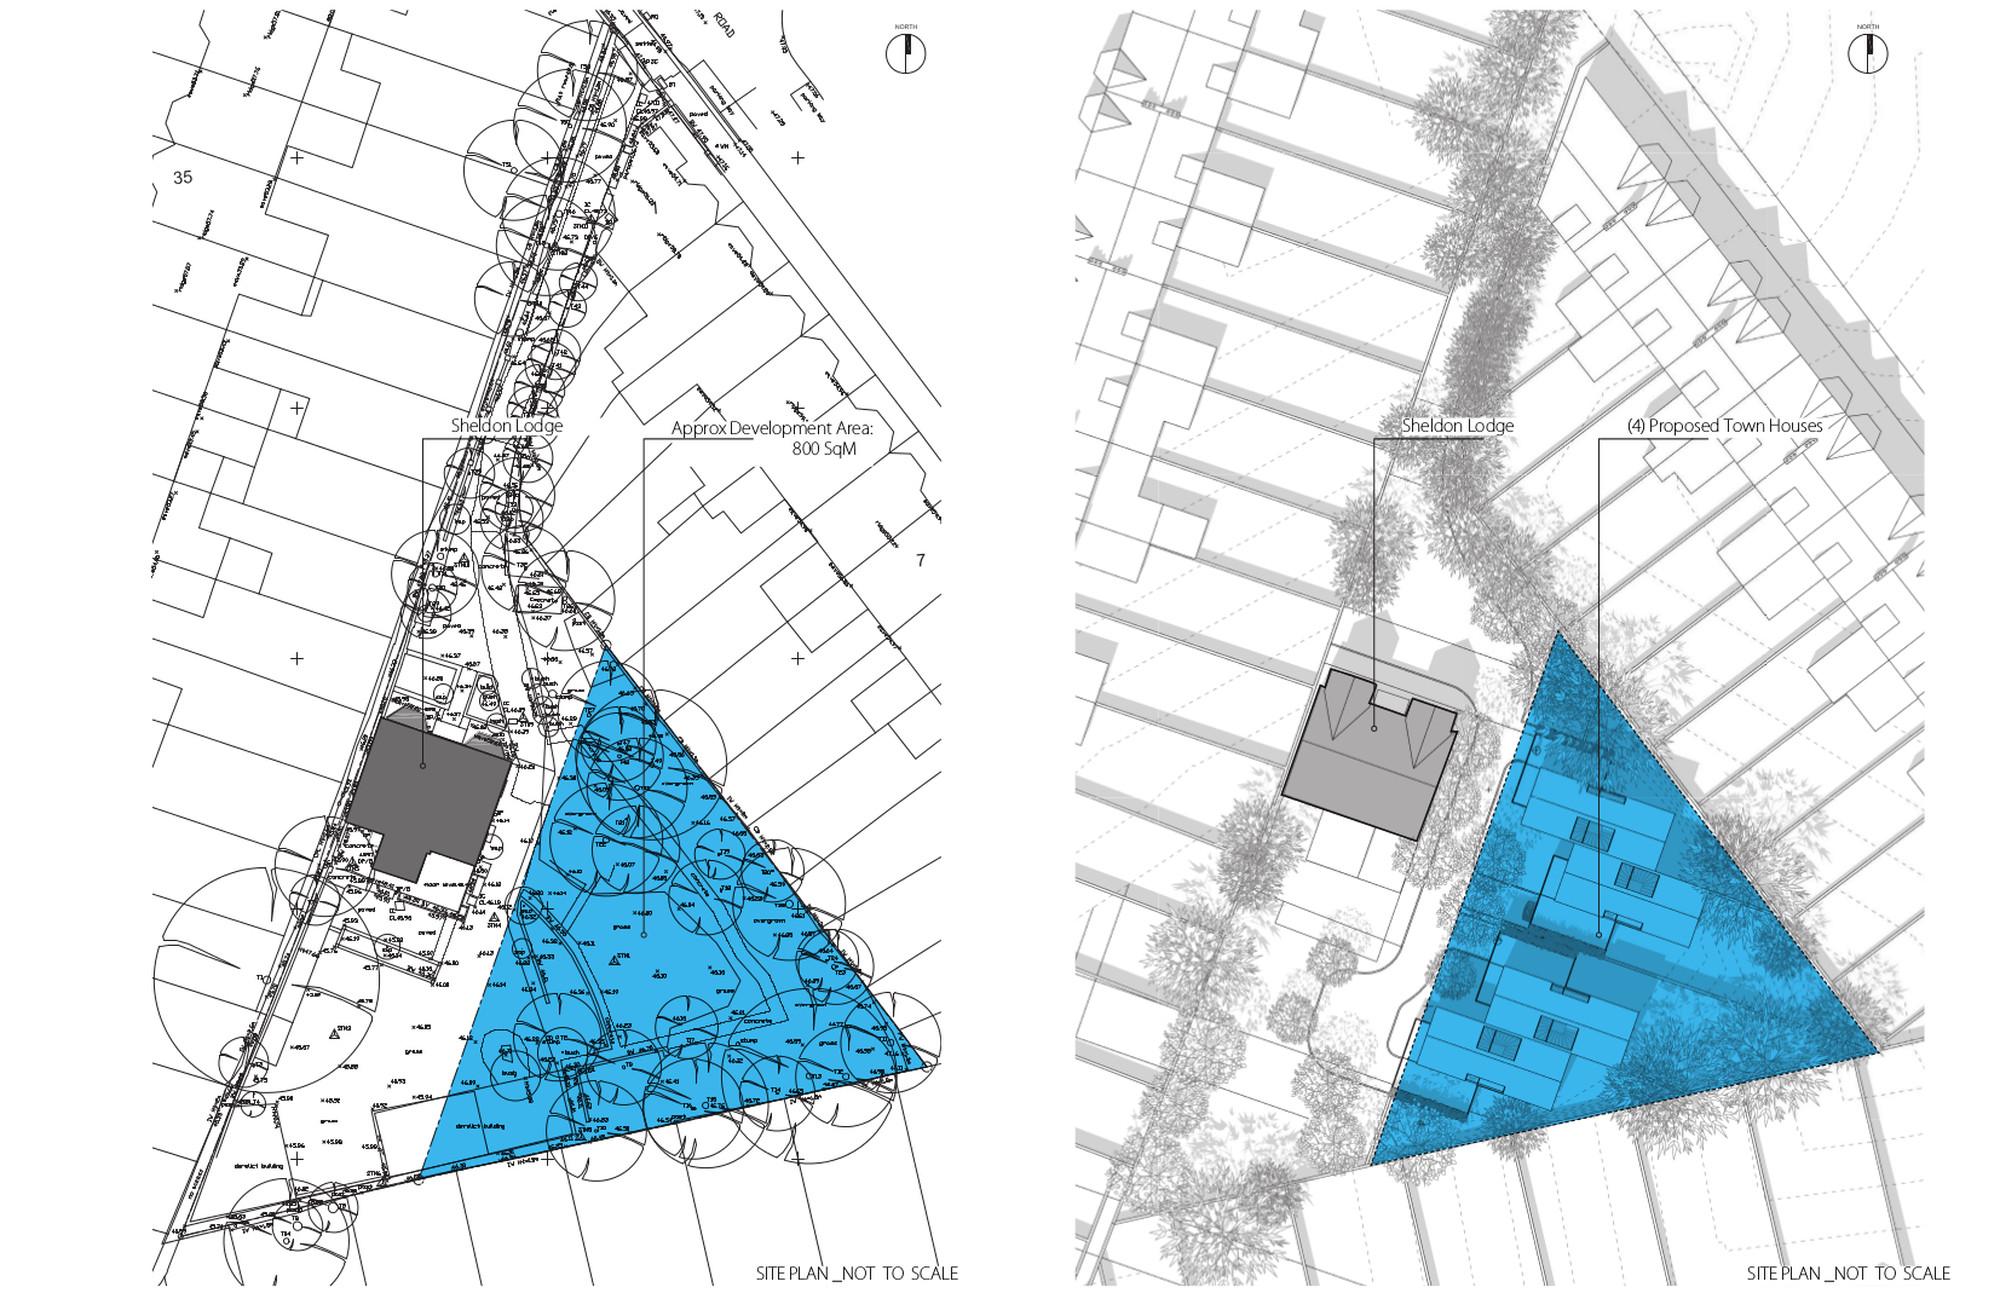 Sheldon Lodge Development Site Maps